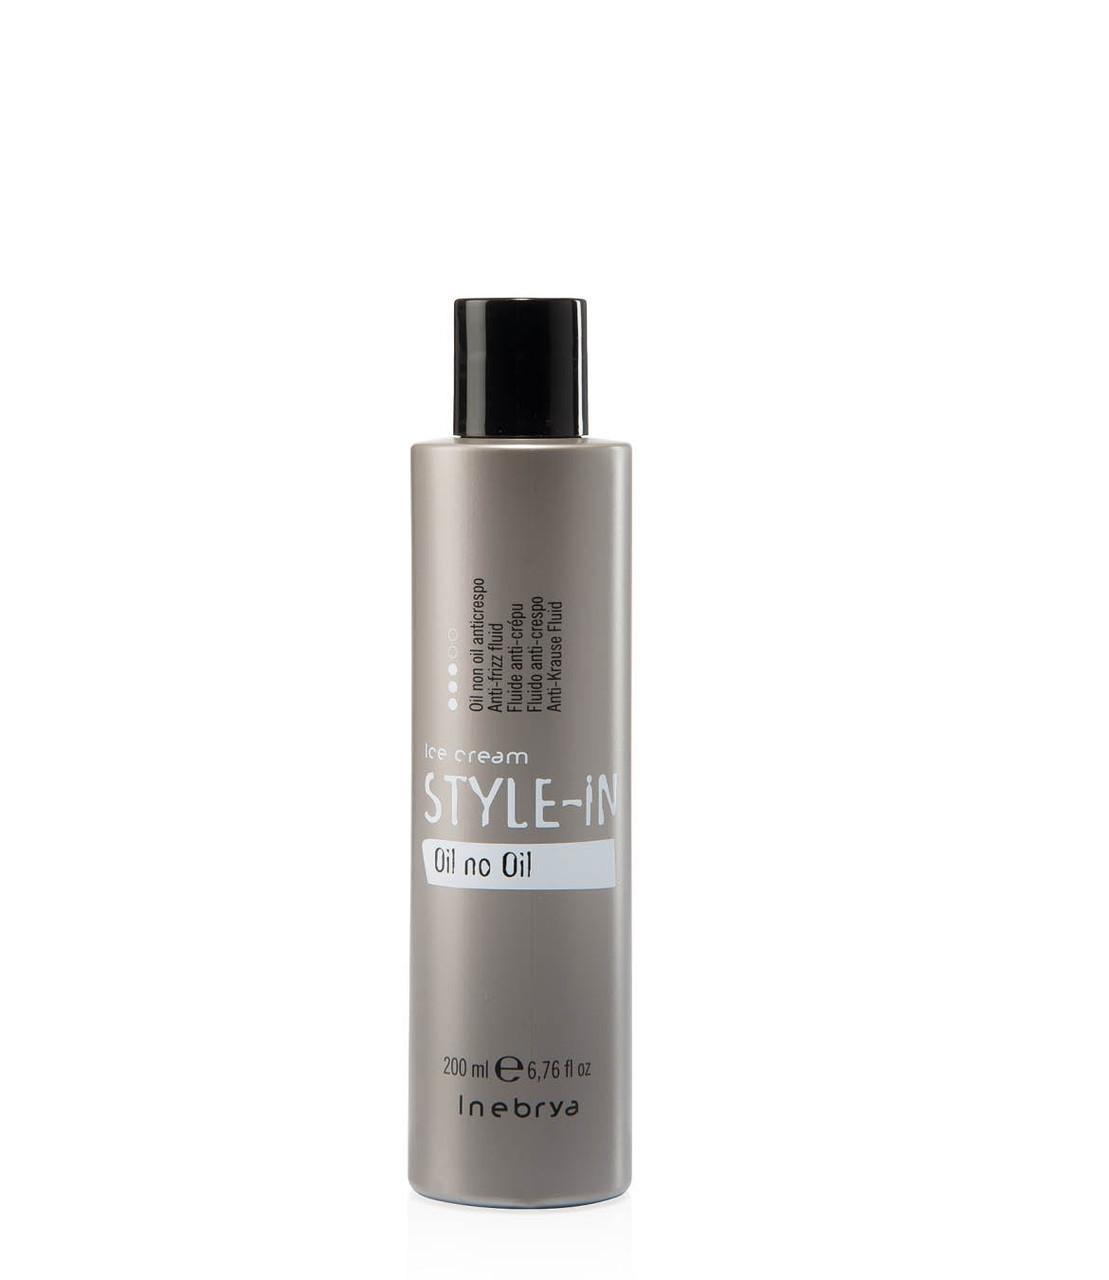 Флюид для выпрямления вьющихся и пушащихся волос Inebrya Style-In Oil Non Oil 200мл